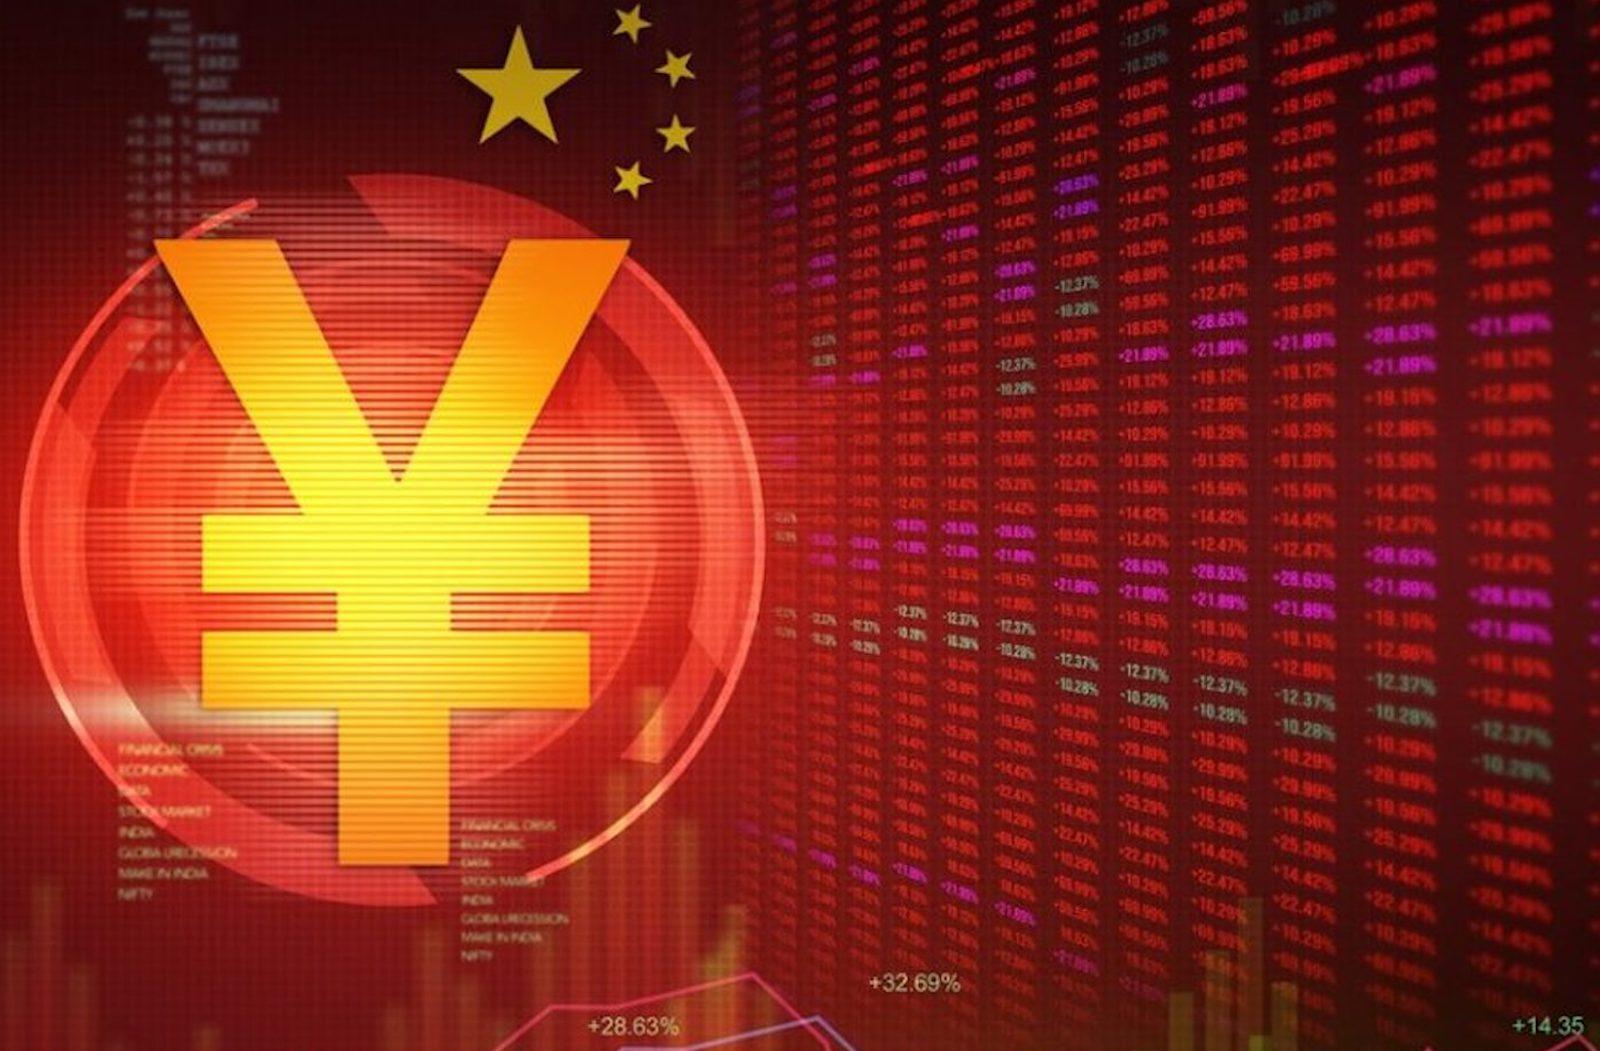 The real motivation behind China's digital yuan - Asia Times